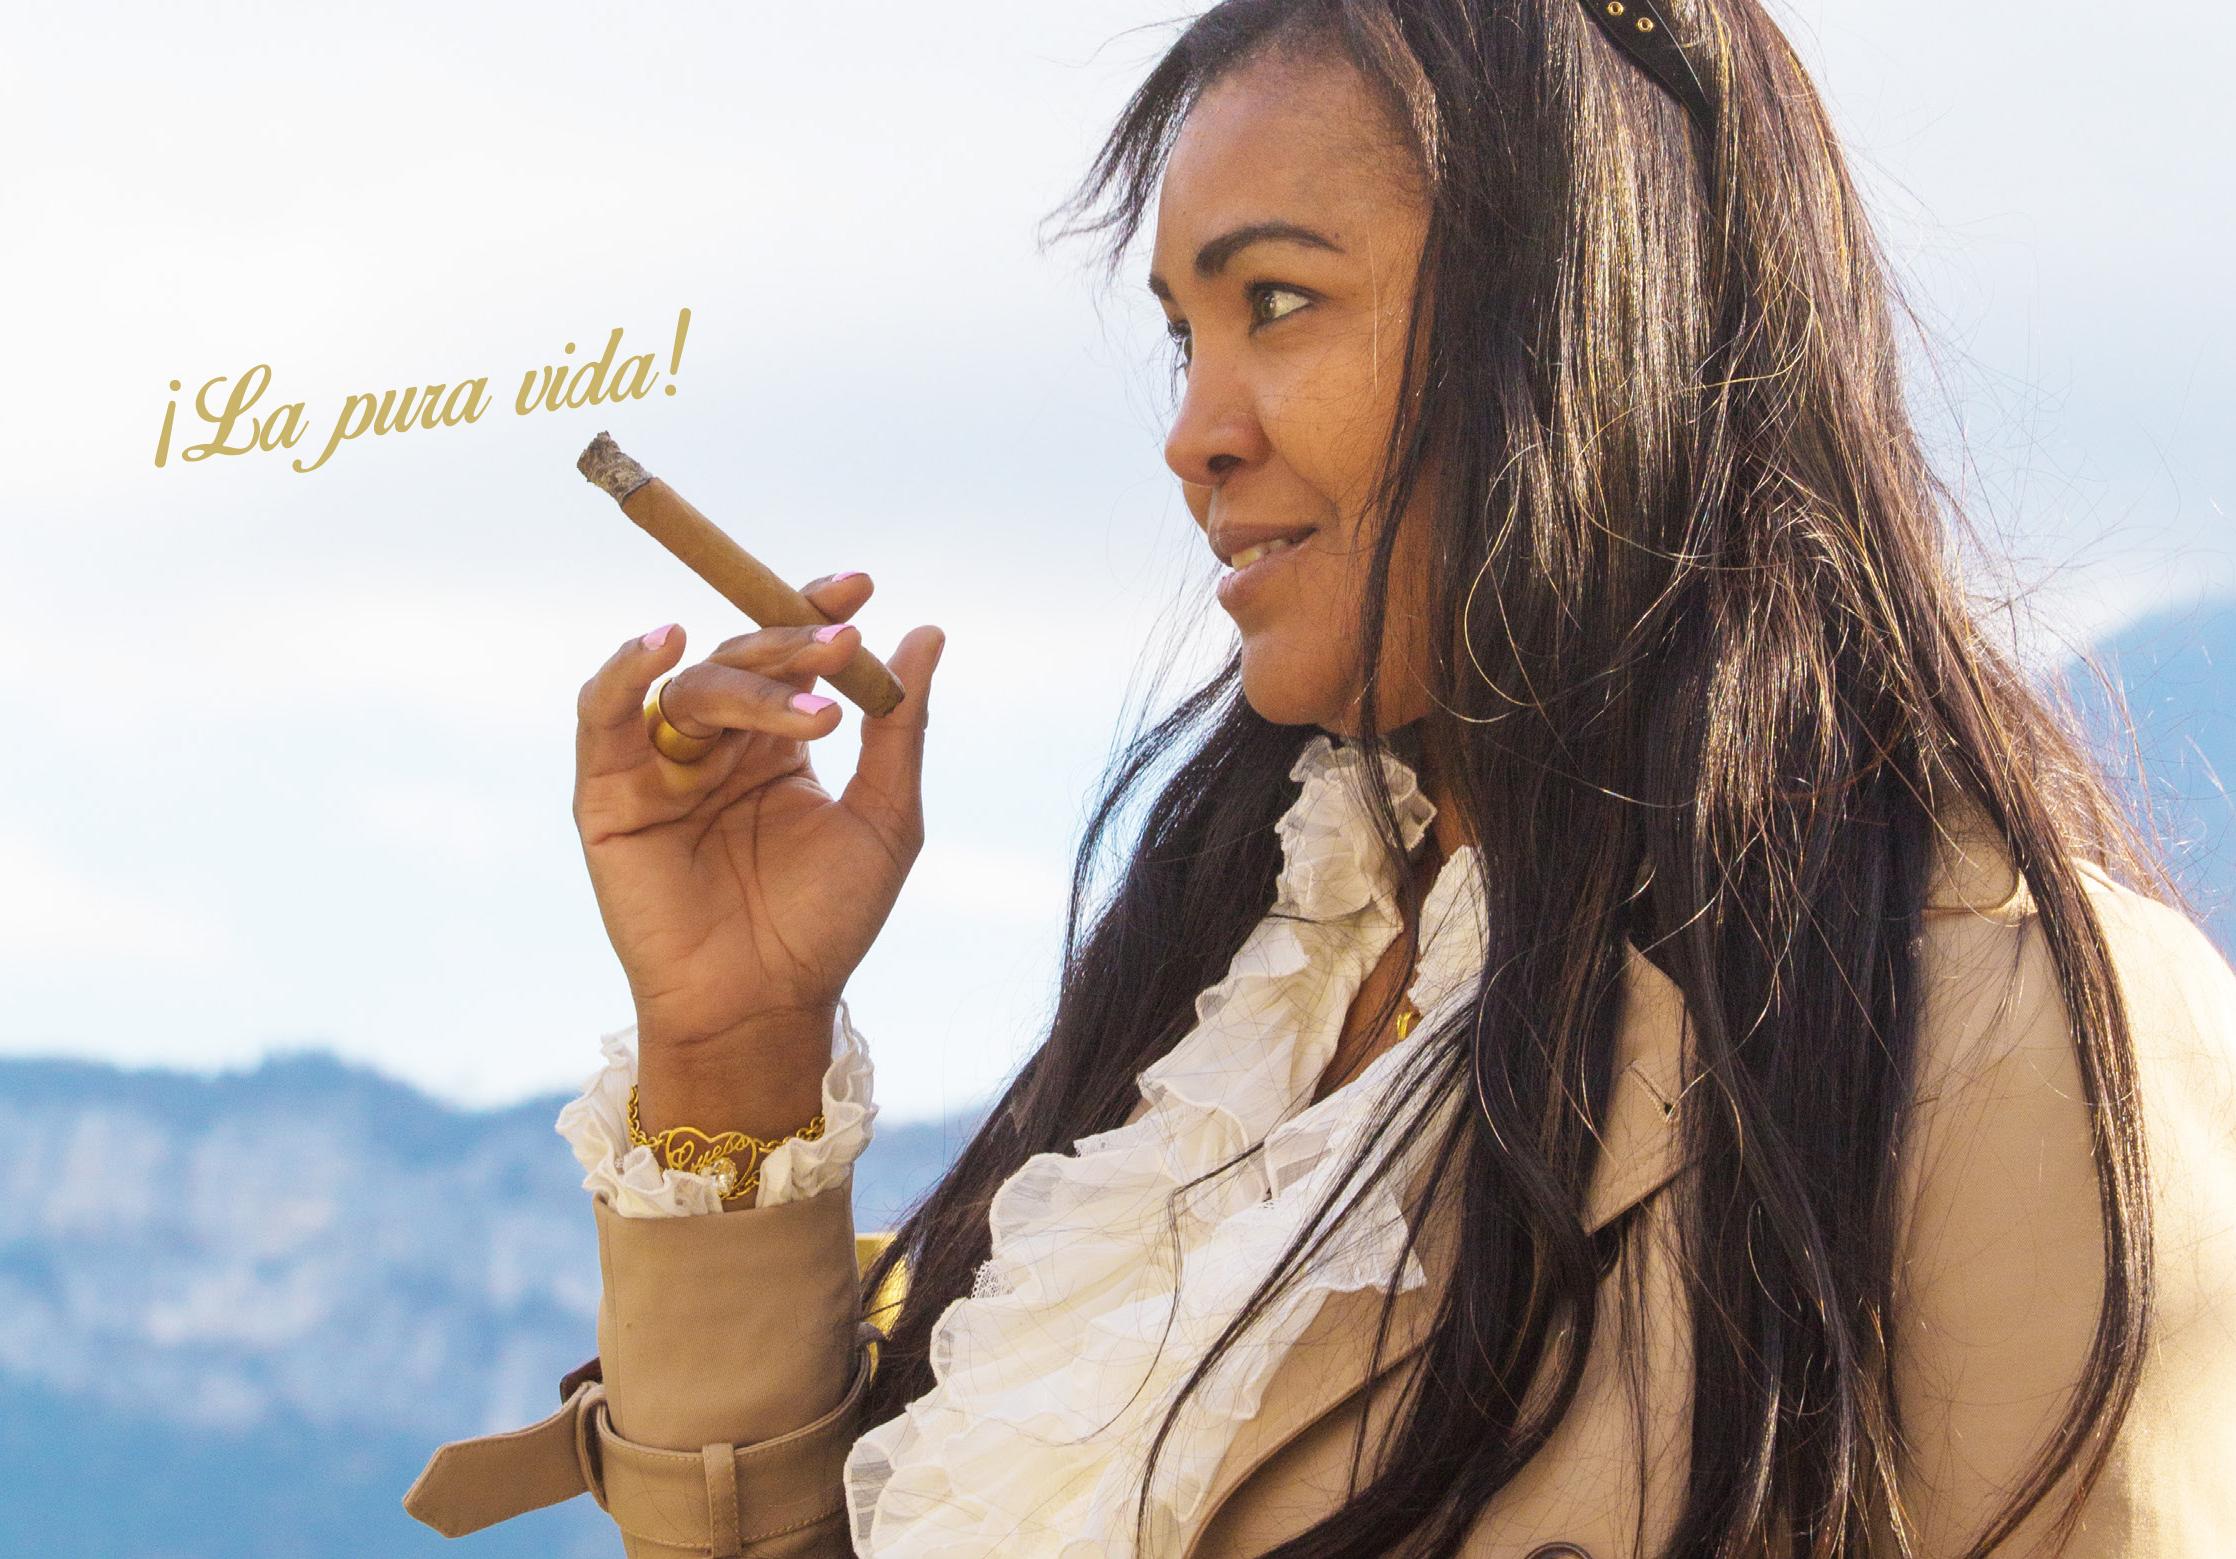 Los Hermanos Zigarren aus der Dominikanischen Republik